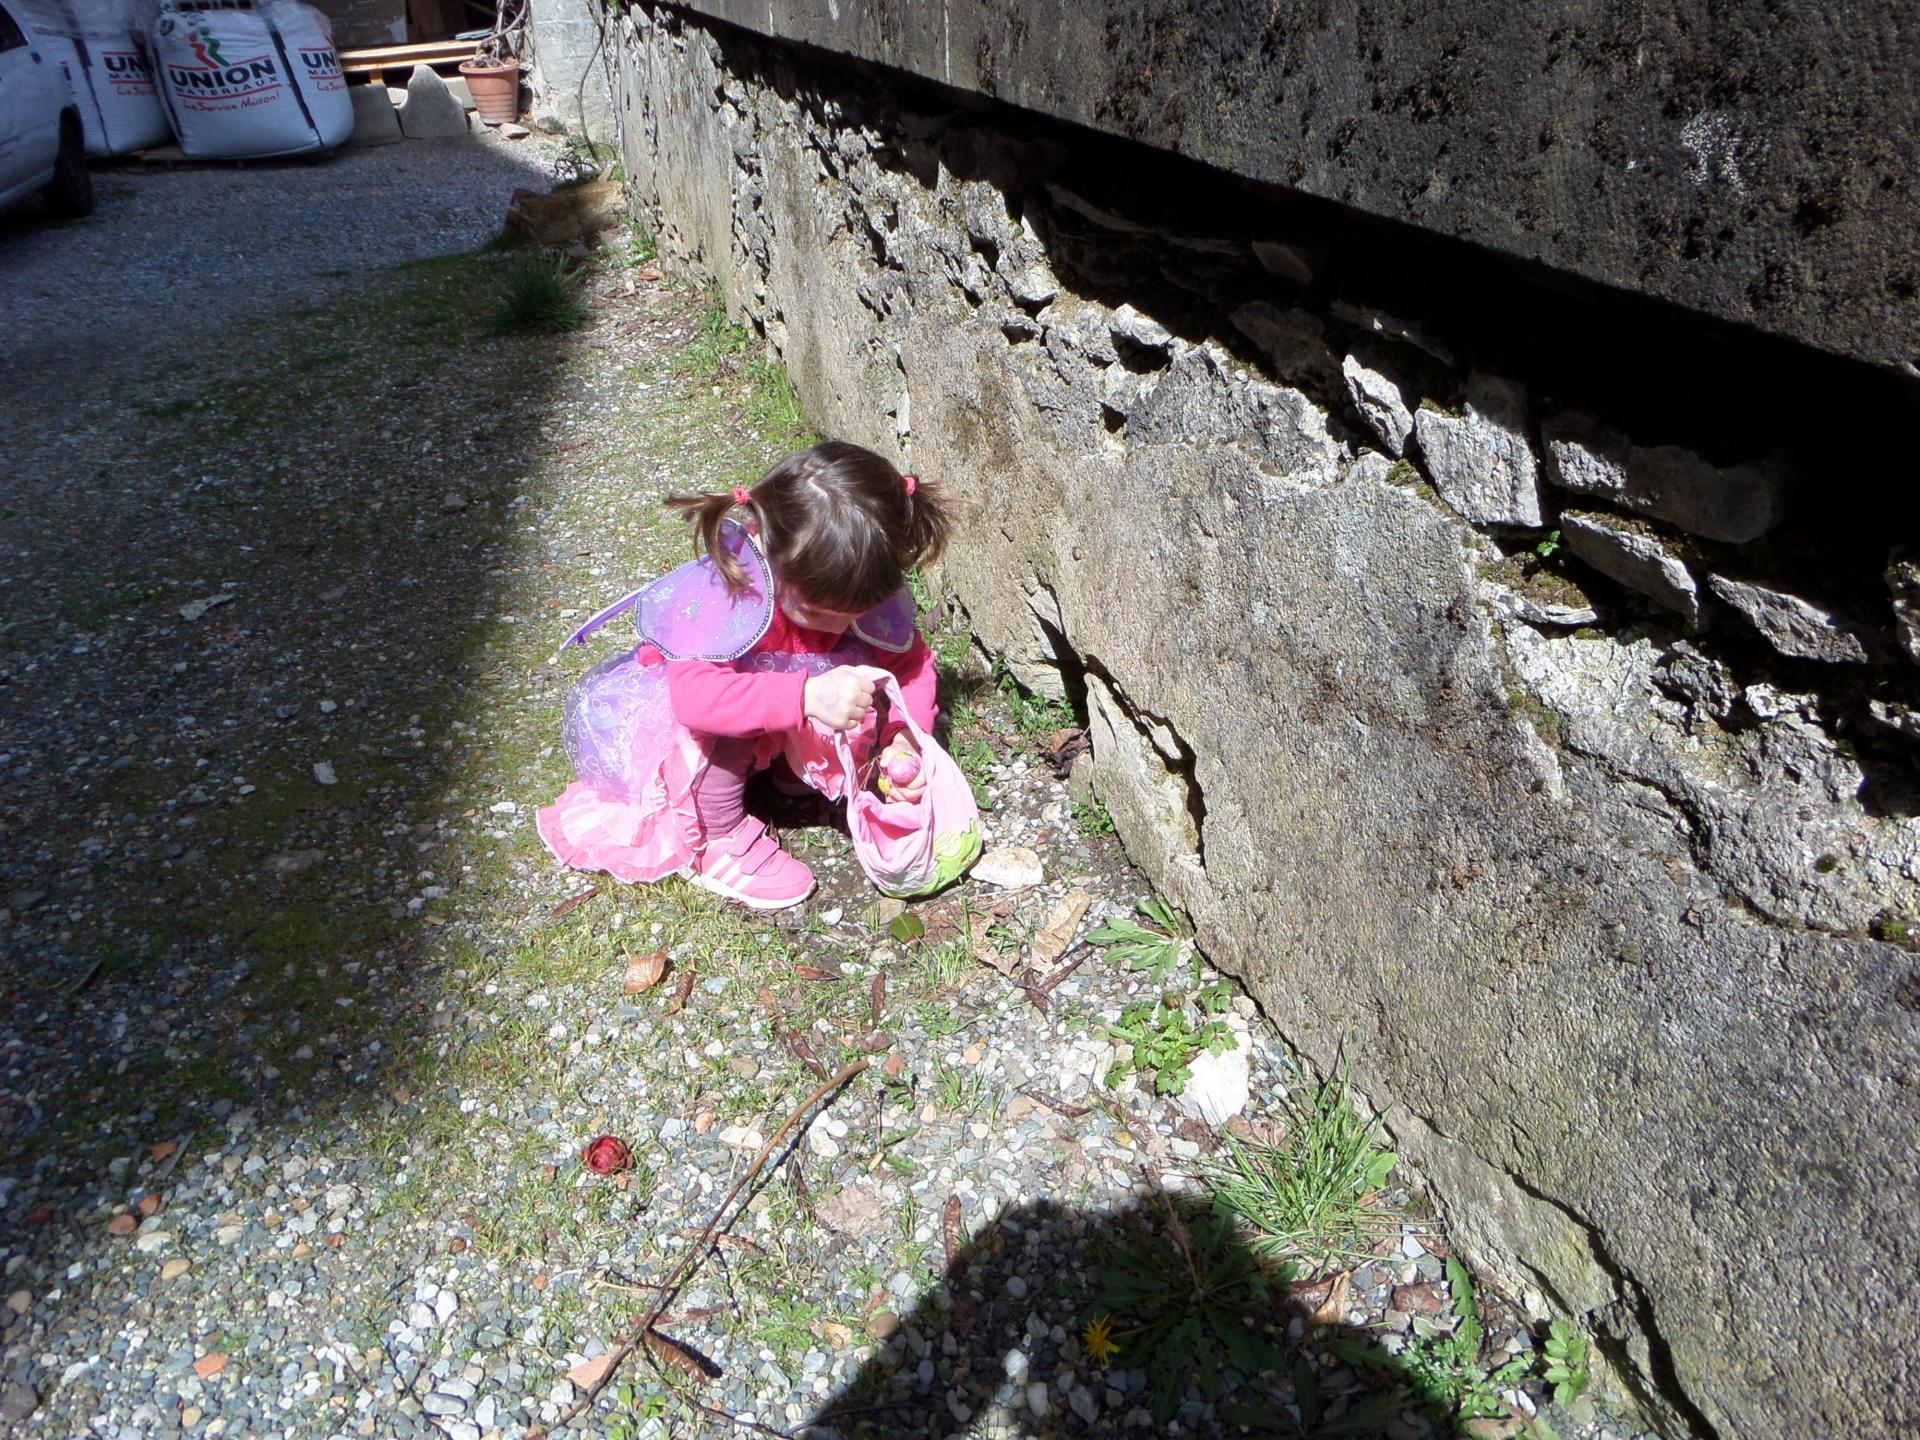 A la recherche des oeufs